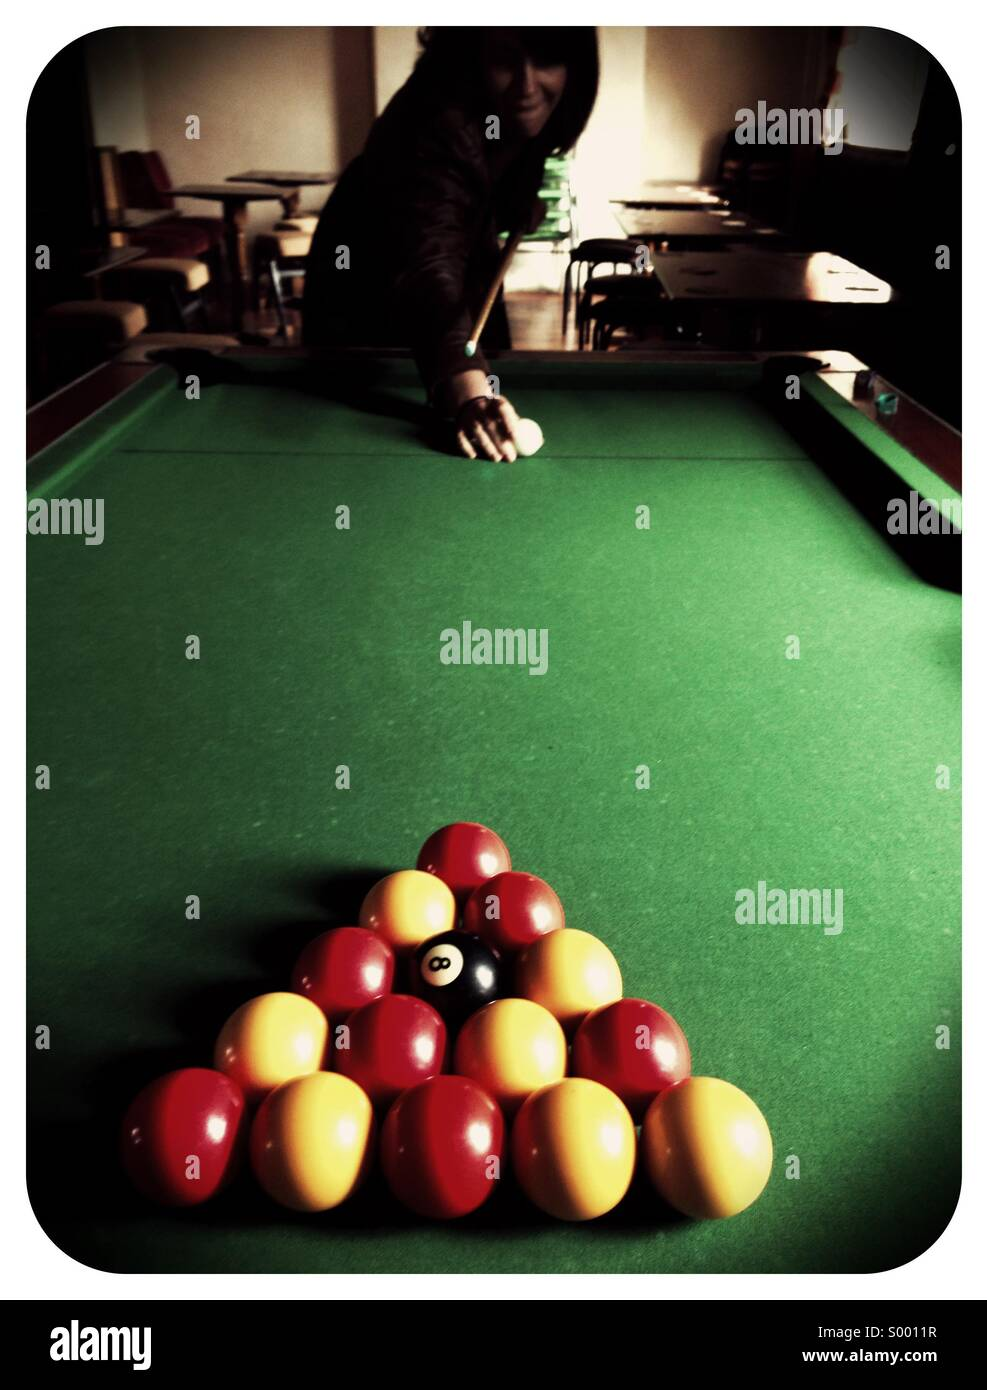 Pool playing - Stock Image